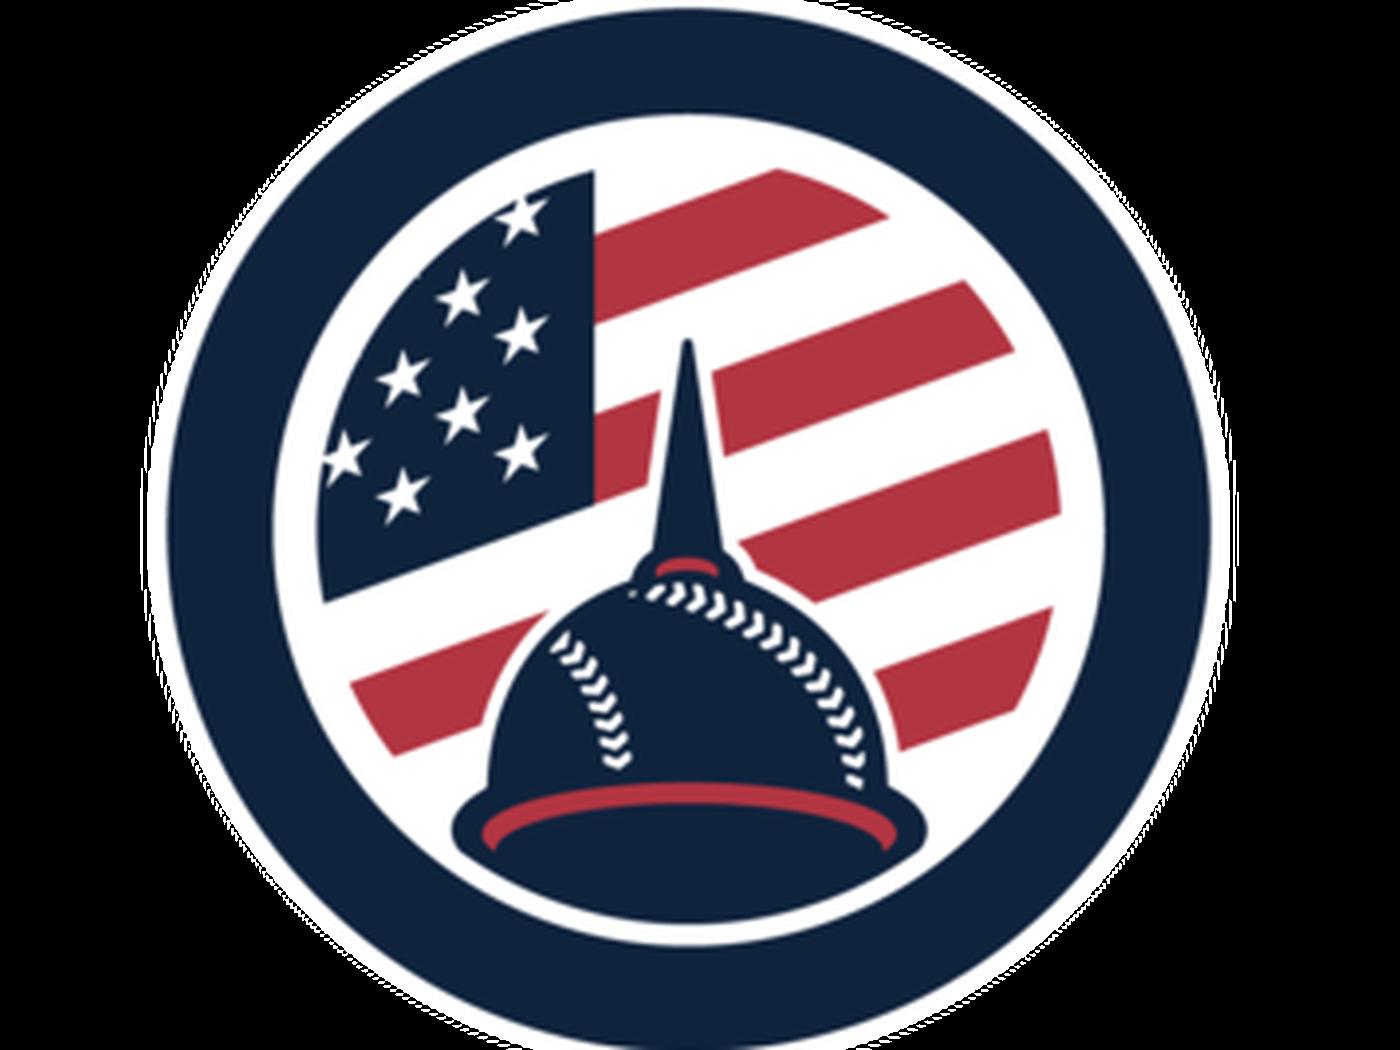 Washington Nationals Drop Sixth Straight To Start Season Atlanta Braves Sweep With 8 5 Win Over Dc Federal Baseball